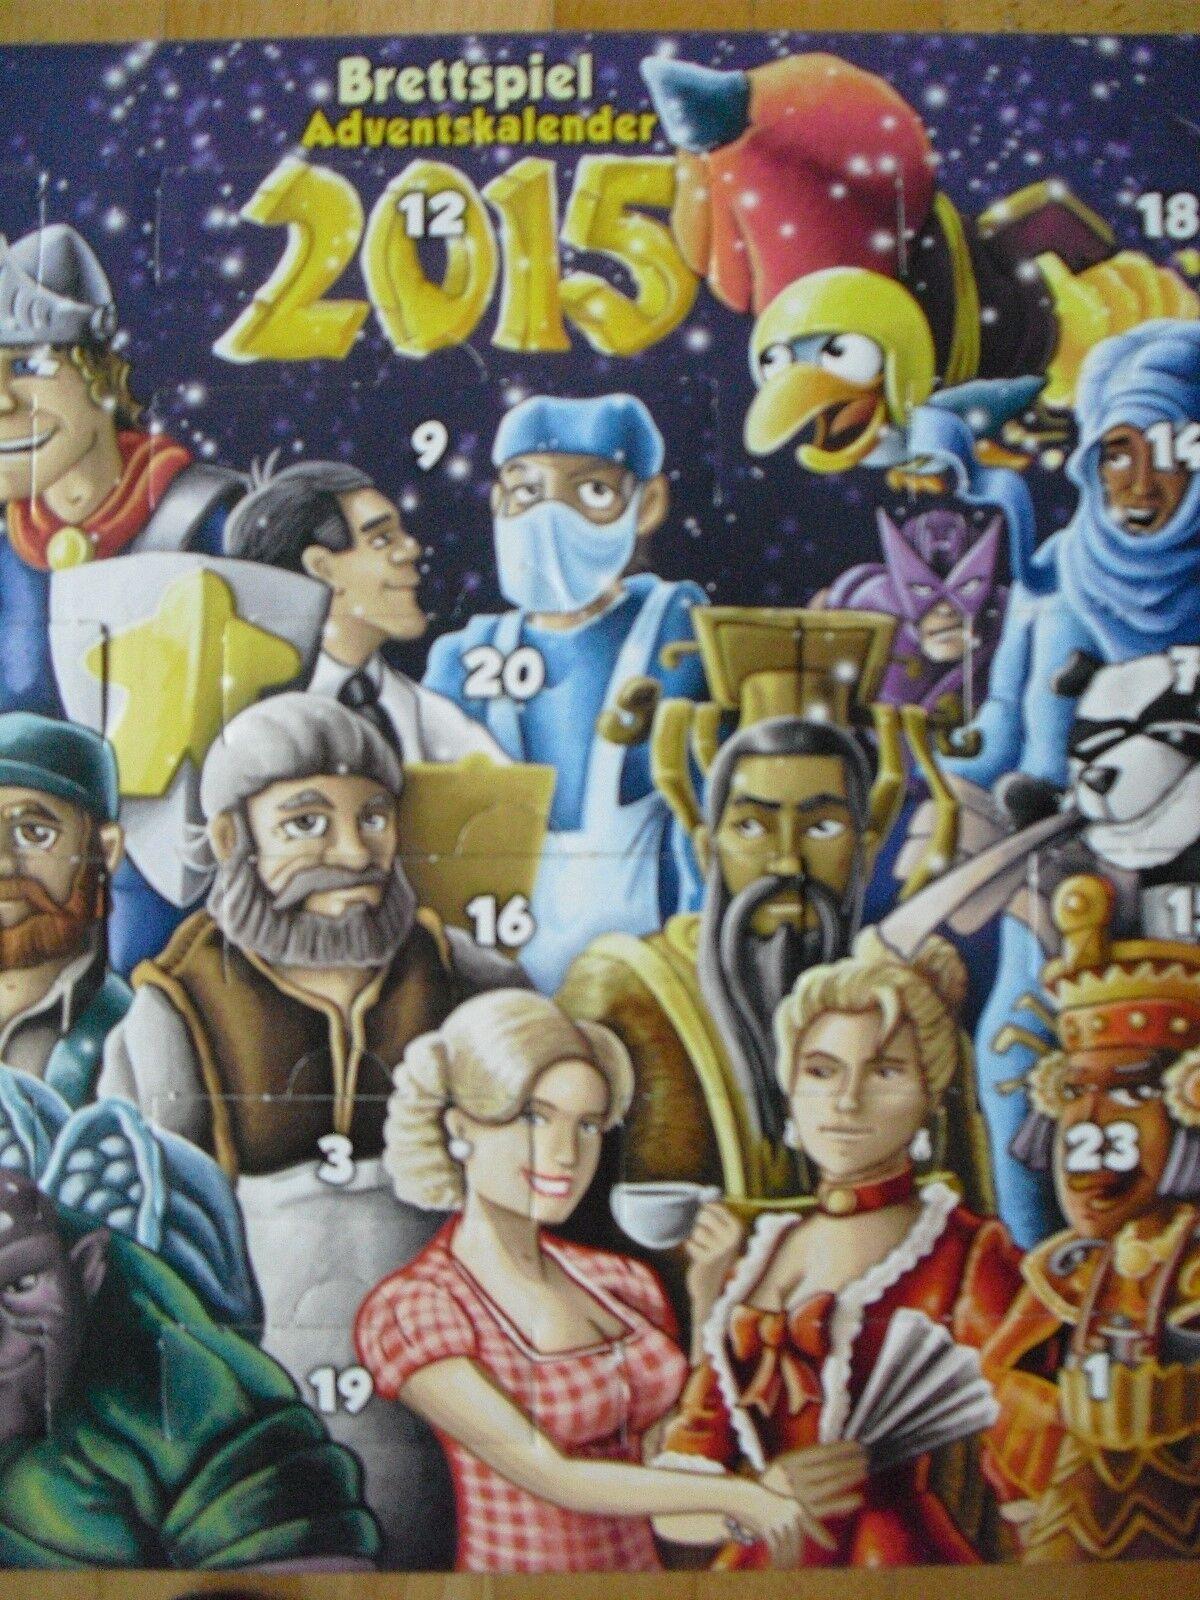 Brettspiel Adventskalender 2015 2015 Adventskalender (Individual Mini-Expansions) 78ad8a